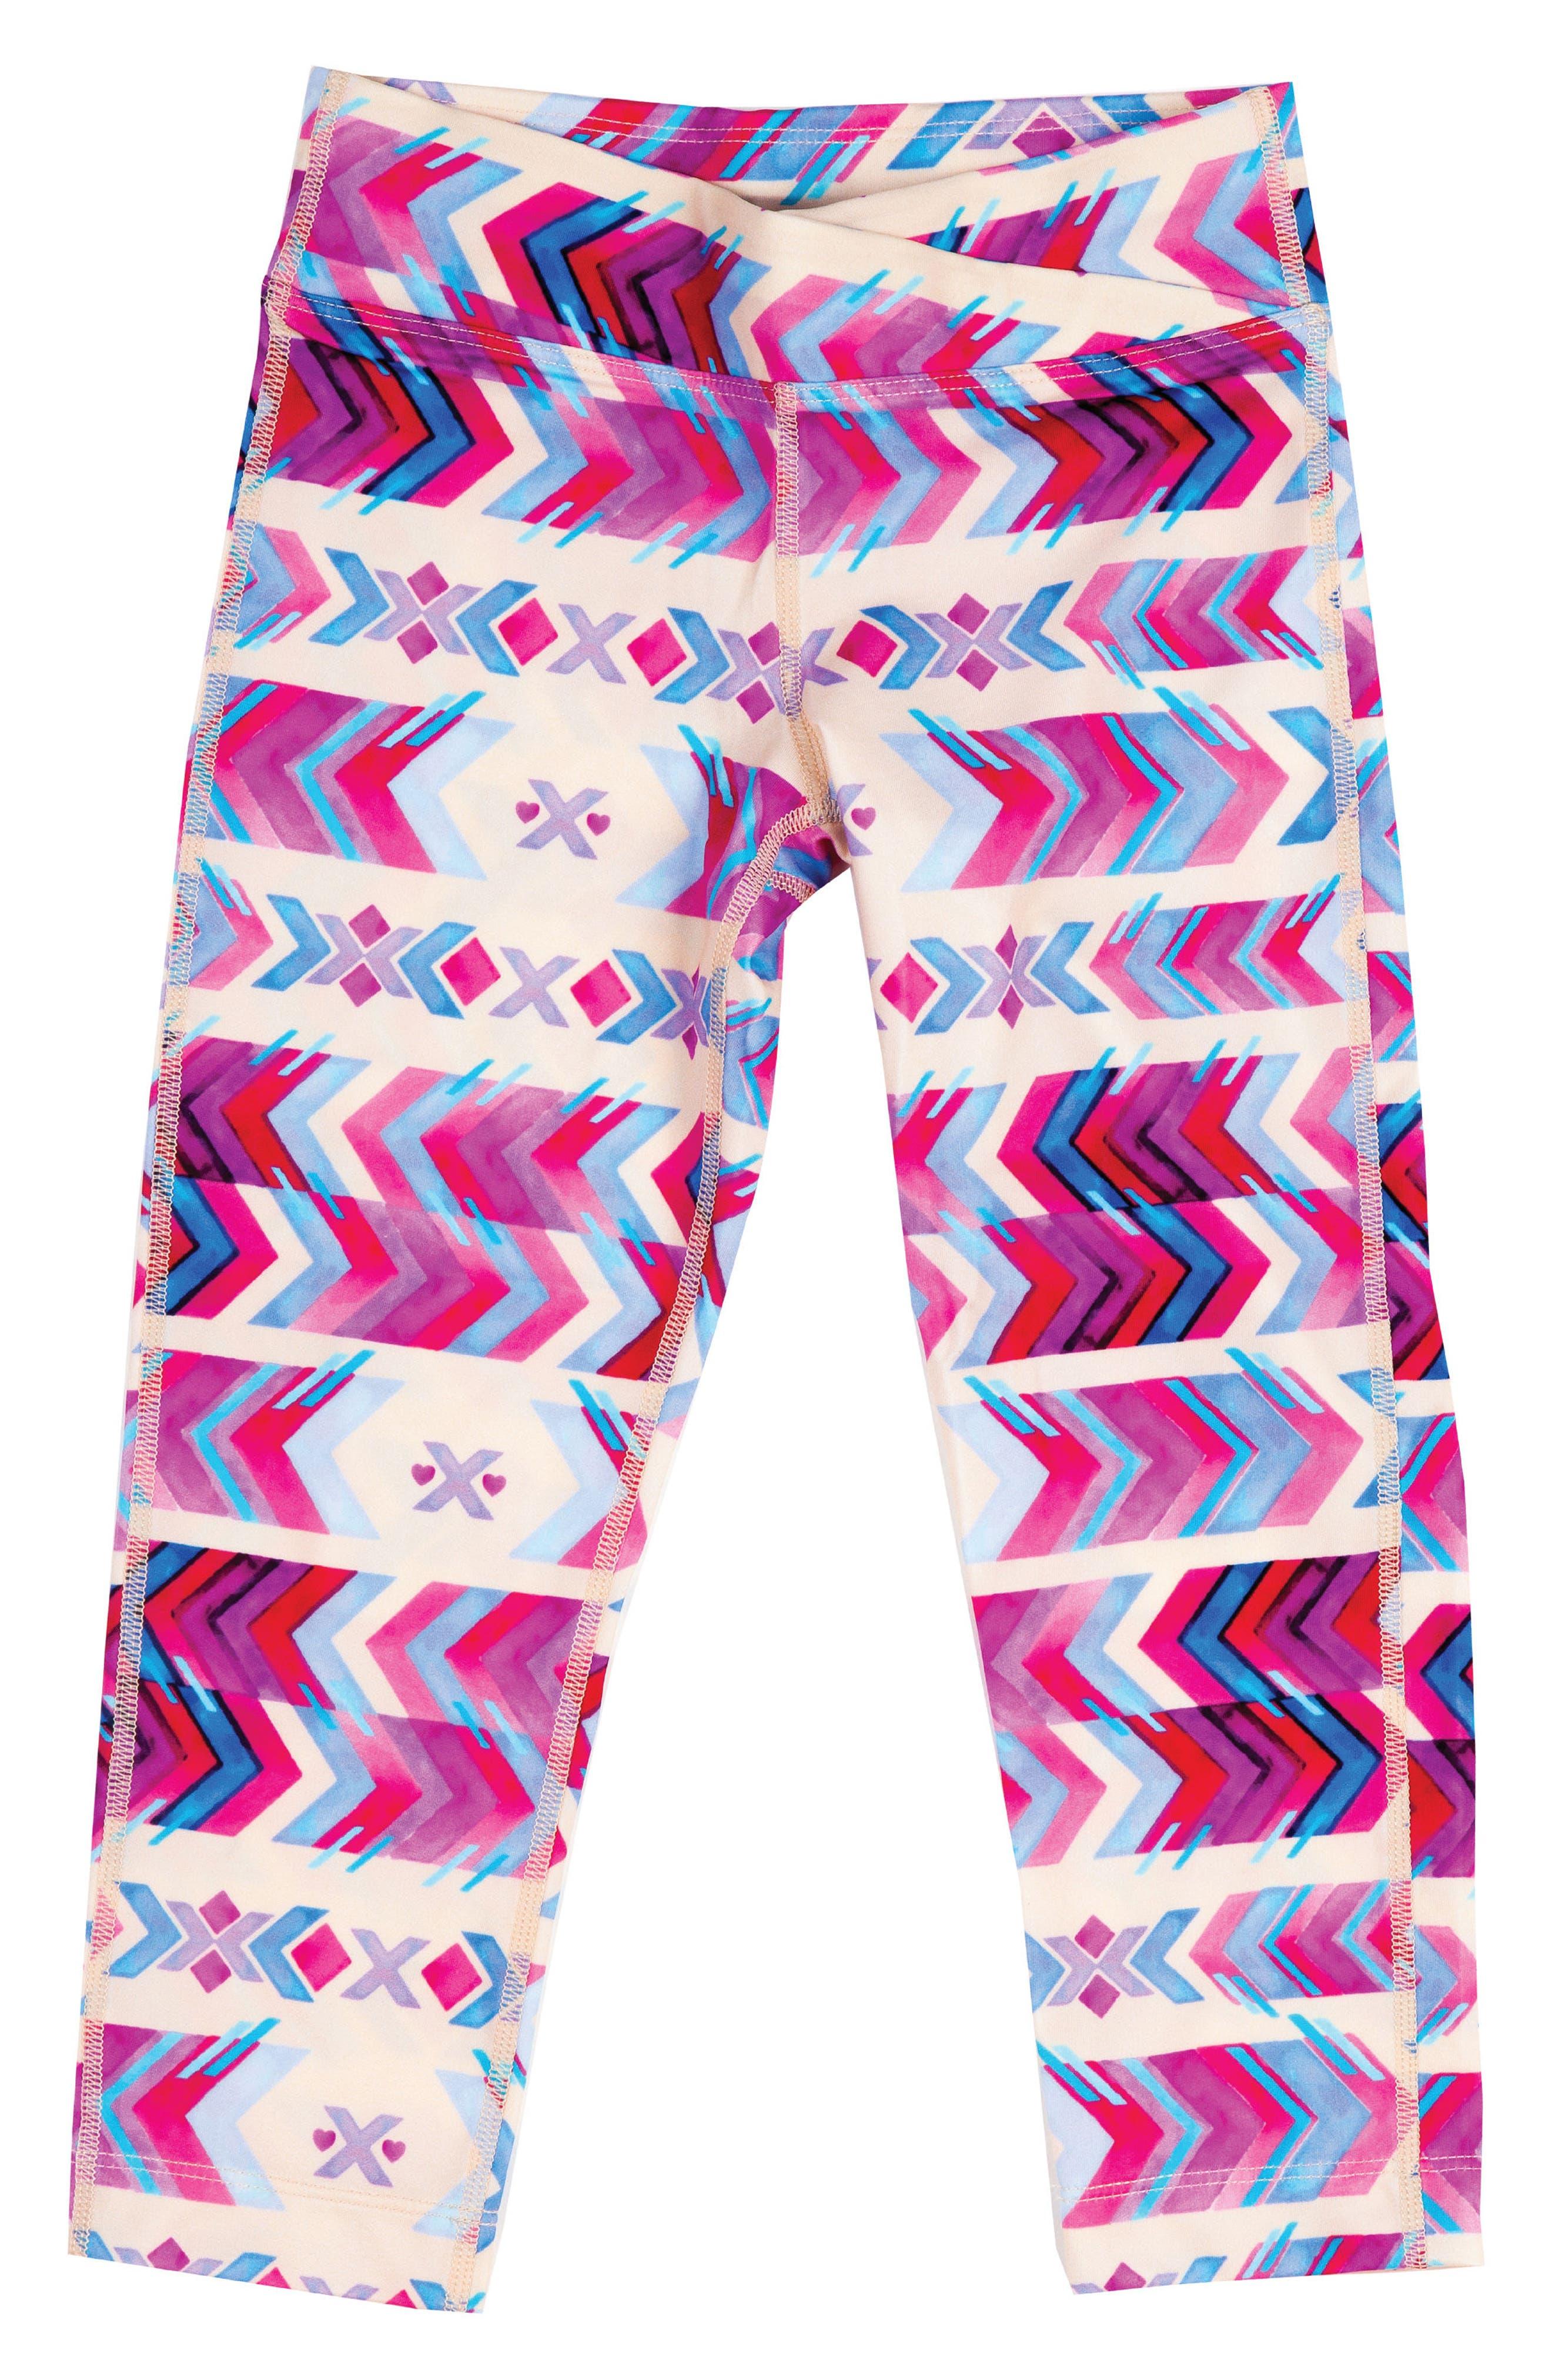 Main Image - BOWIE X JAMES Surf's Up Swim Leggings (Toddler Girls, Little Girls & Big Girls)